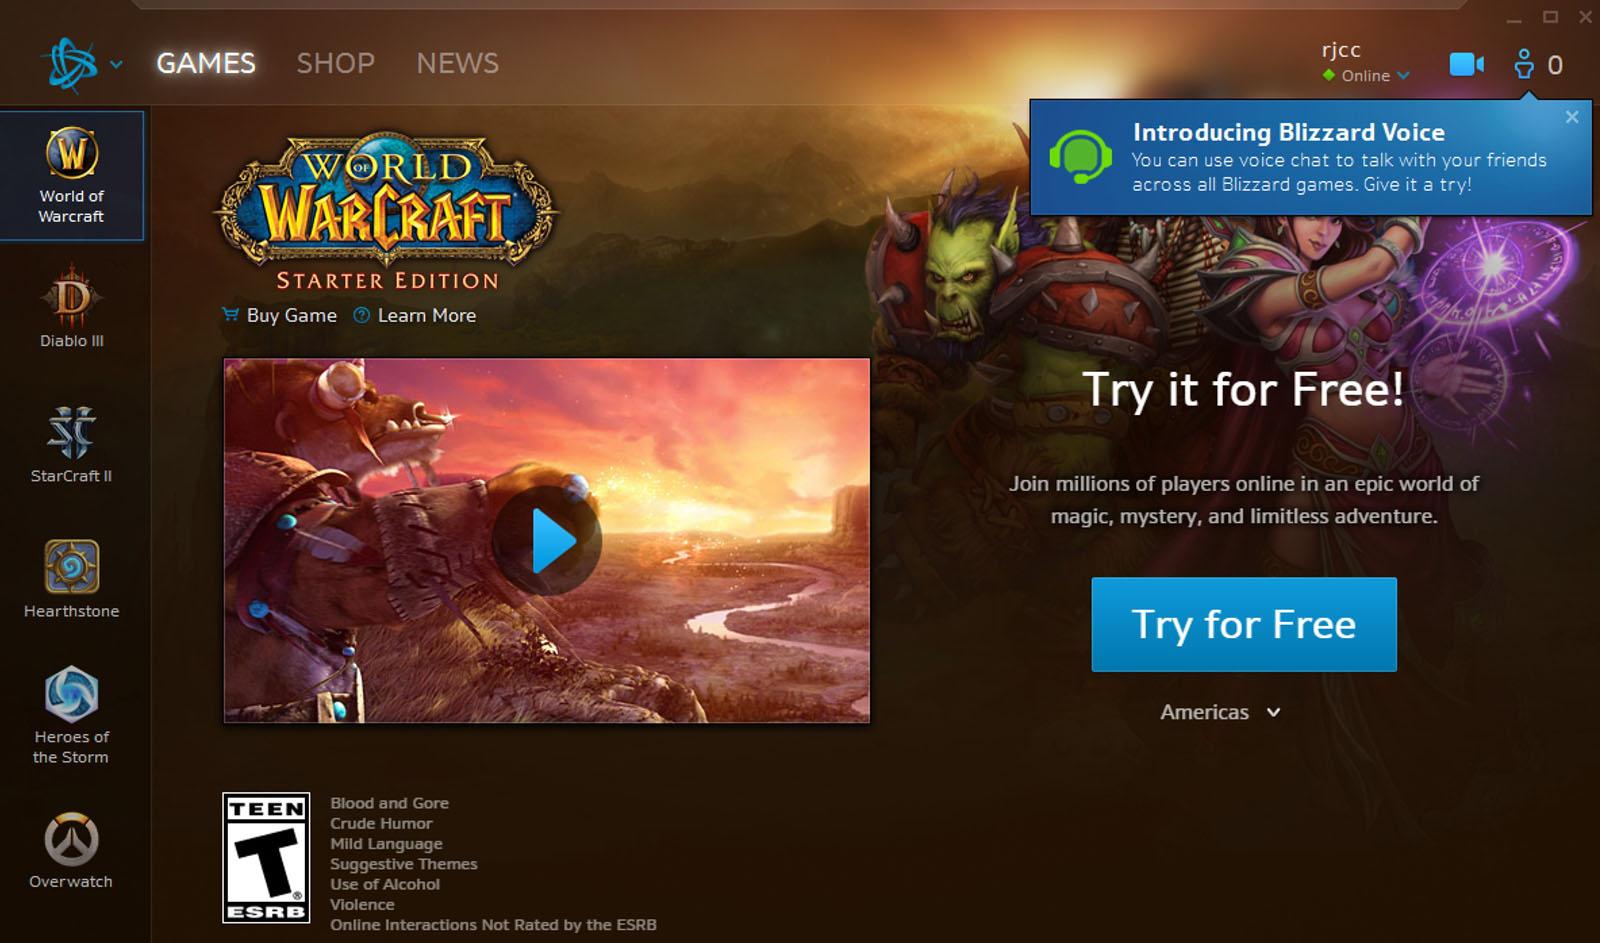 Blizzard live chat